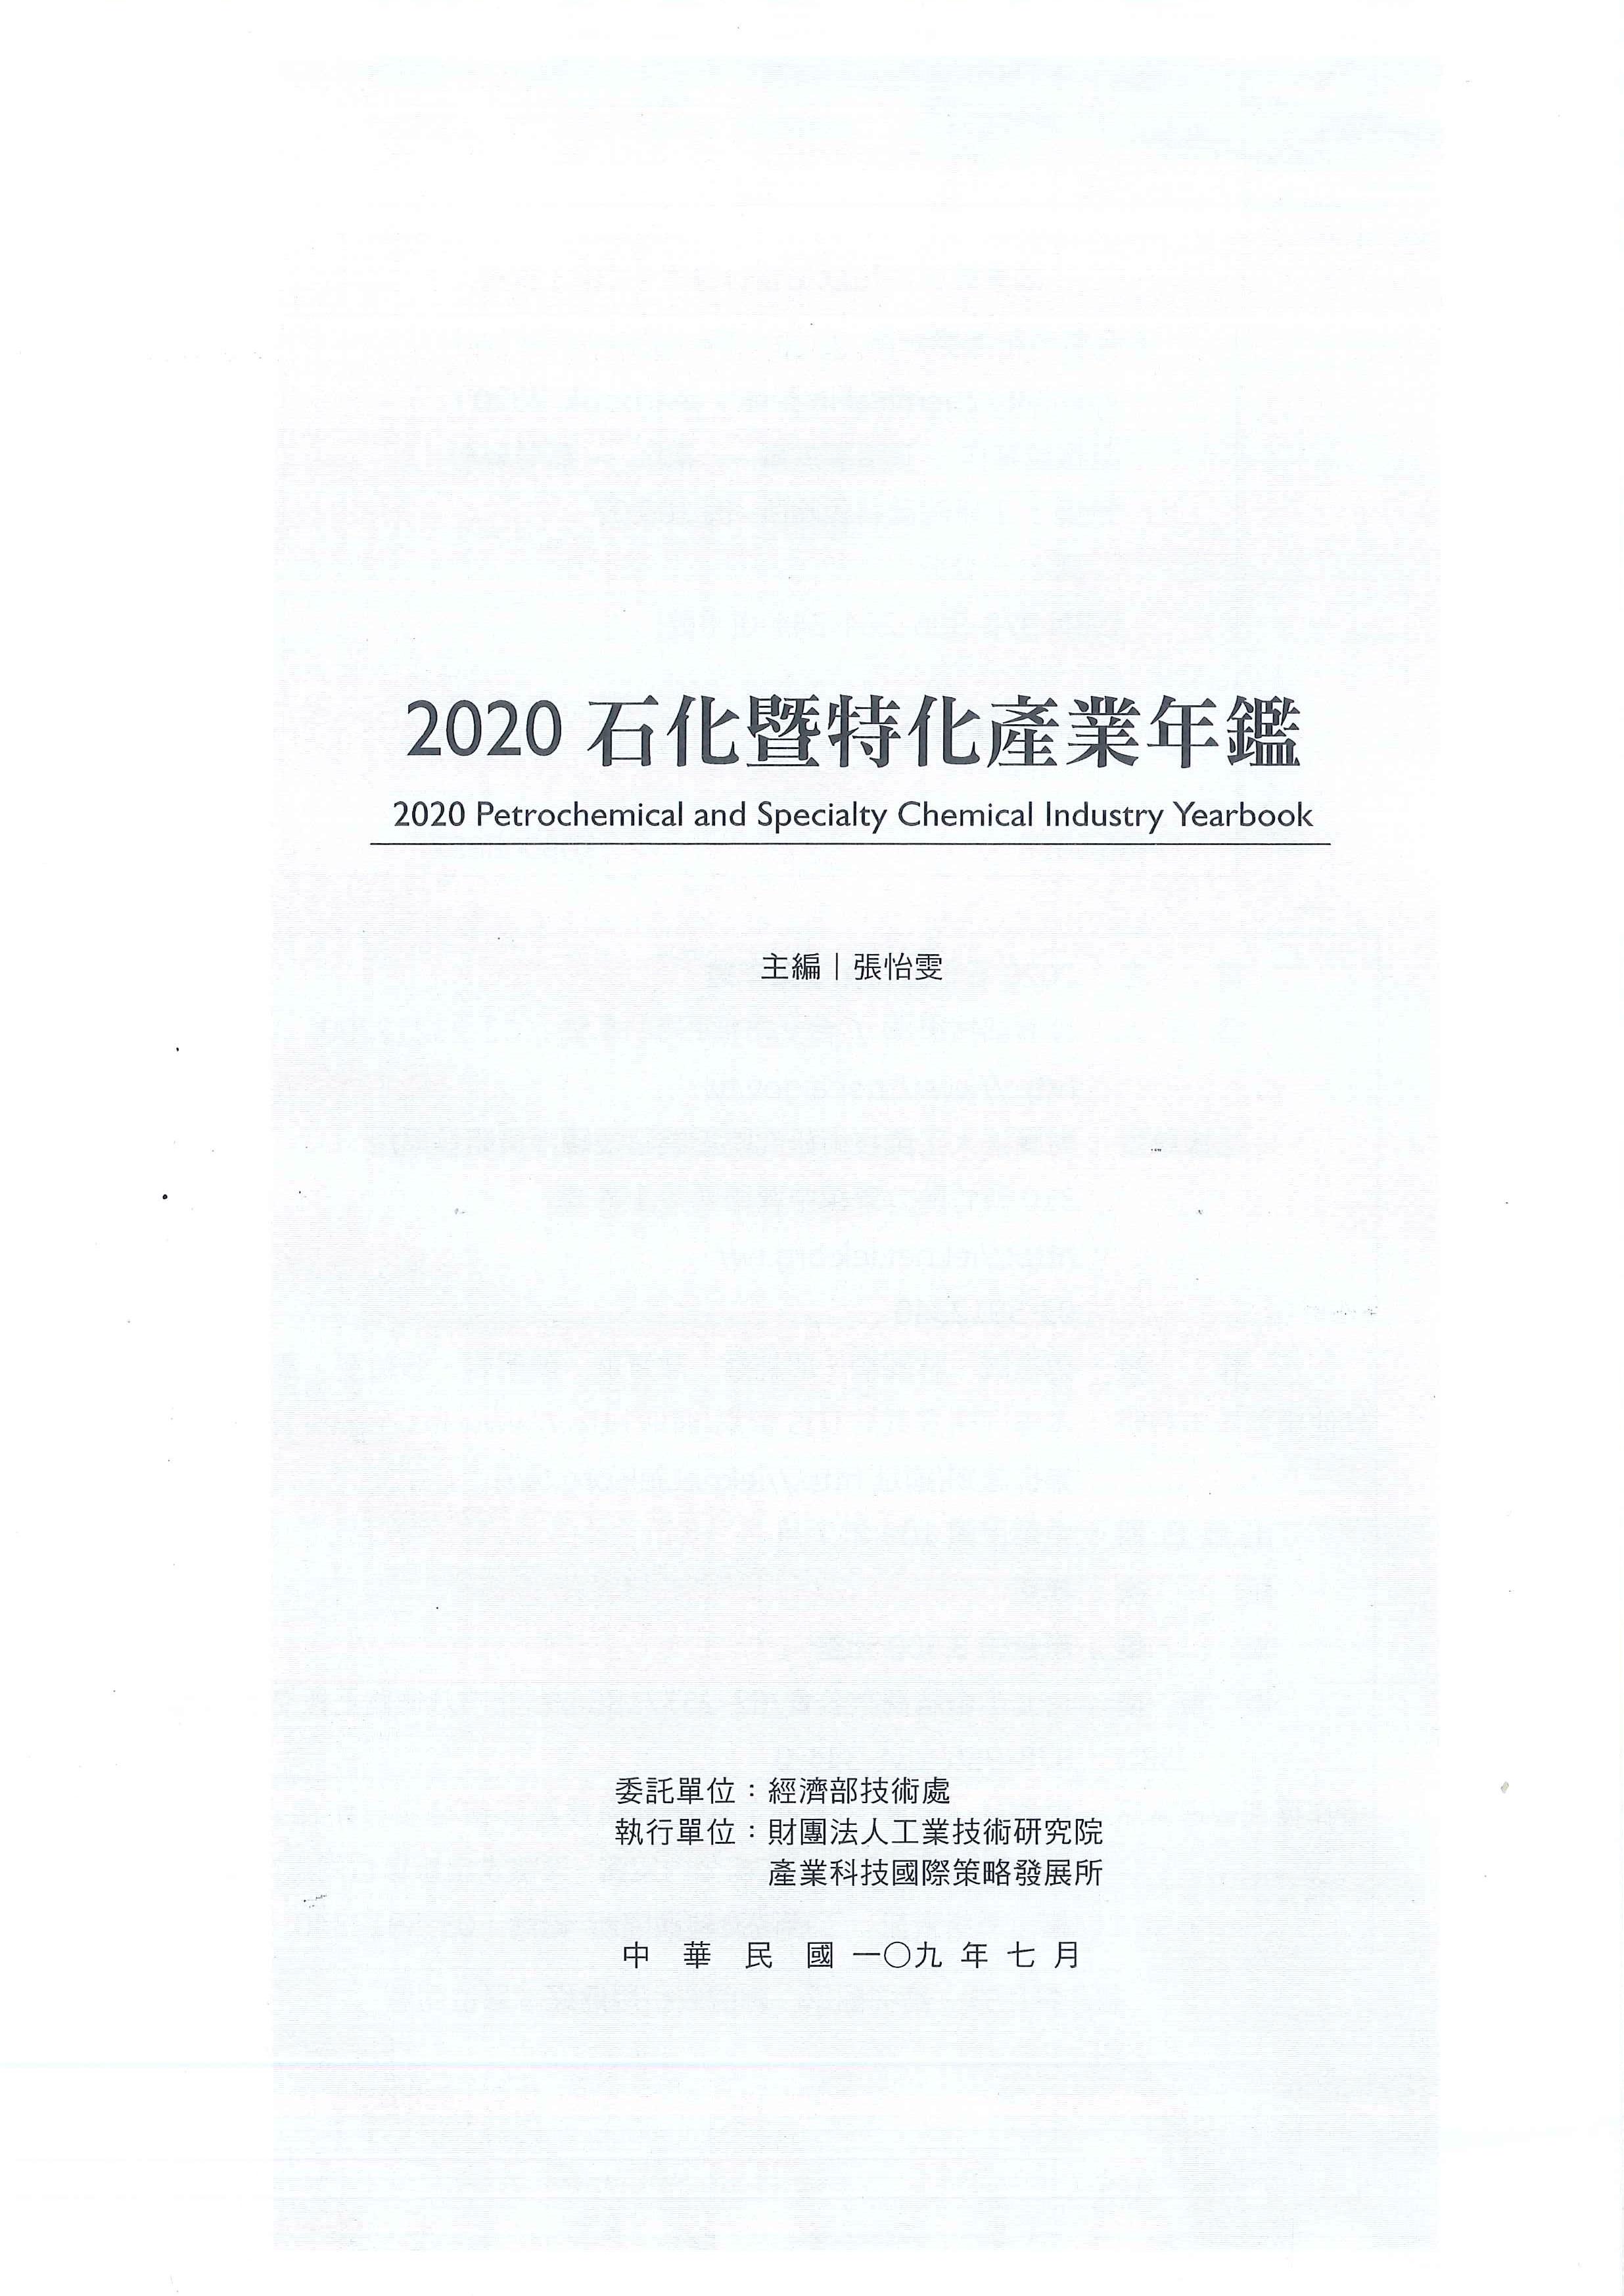 石化暨特化產業年鑑=Petrochemical and specialty chemical industry yearbook